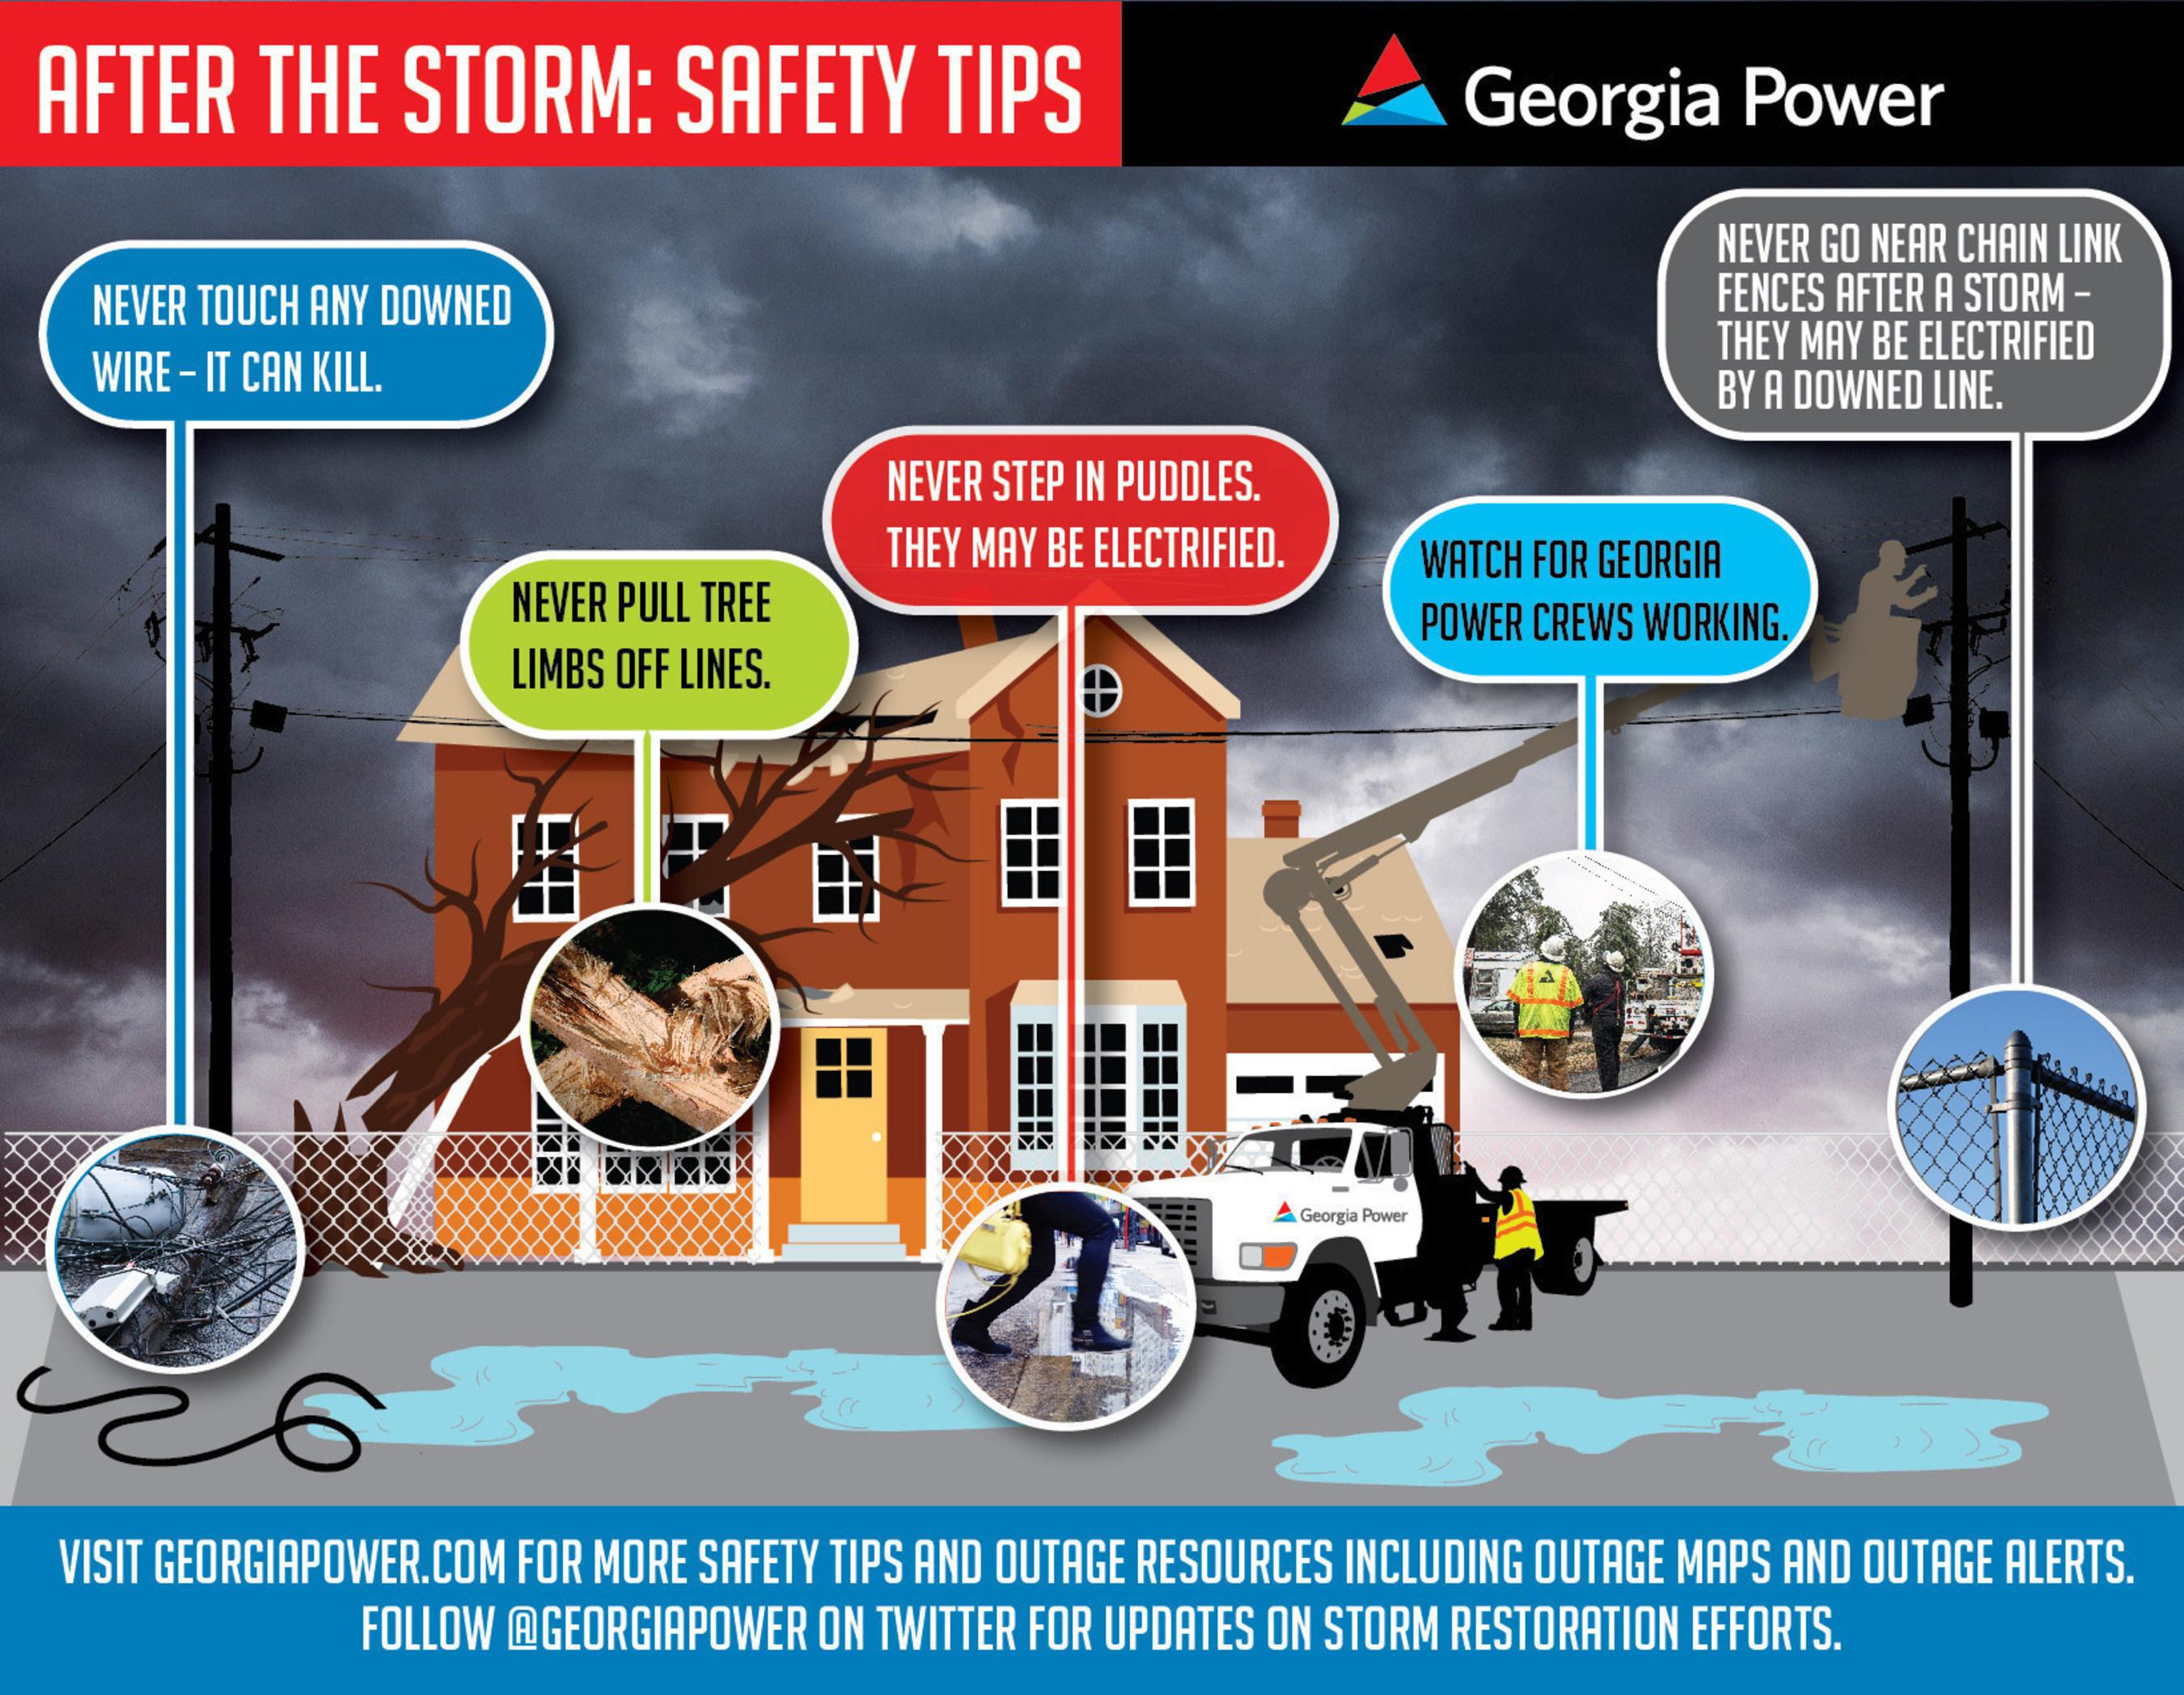 Georgia Power Begins Hurricane Matthew Restoration Efforts